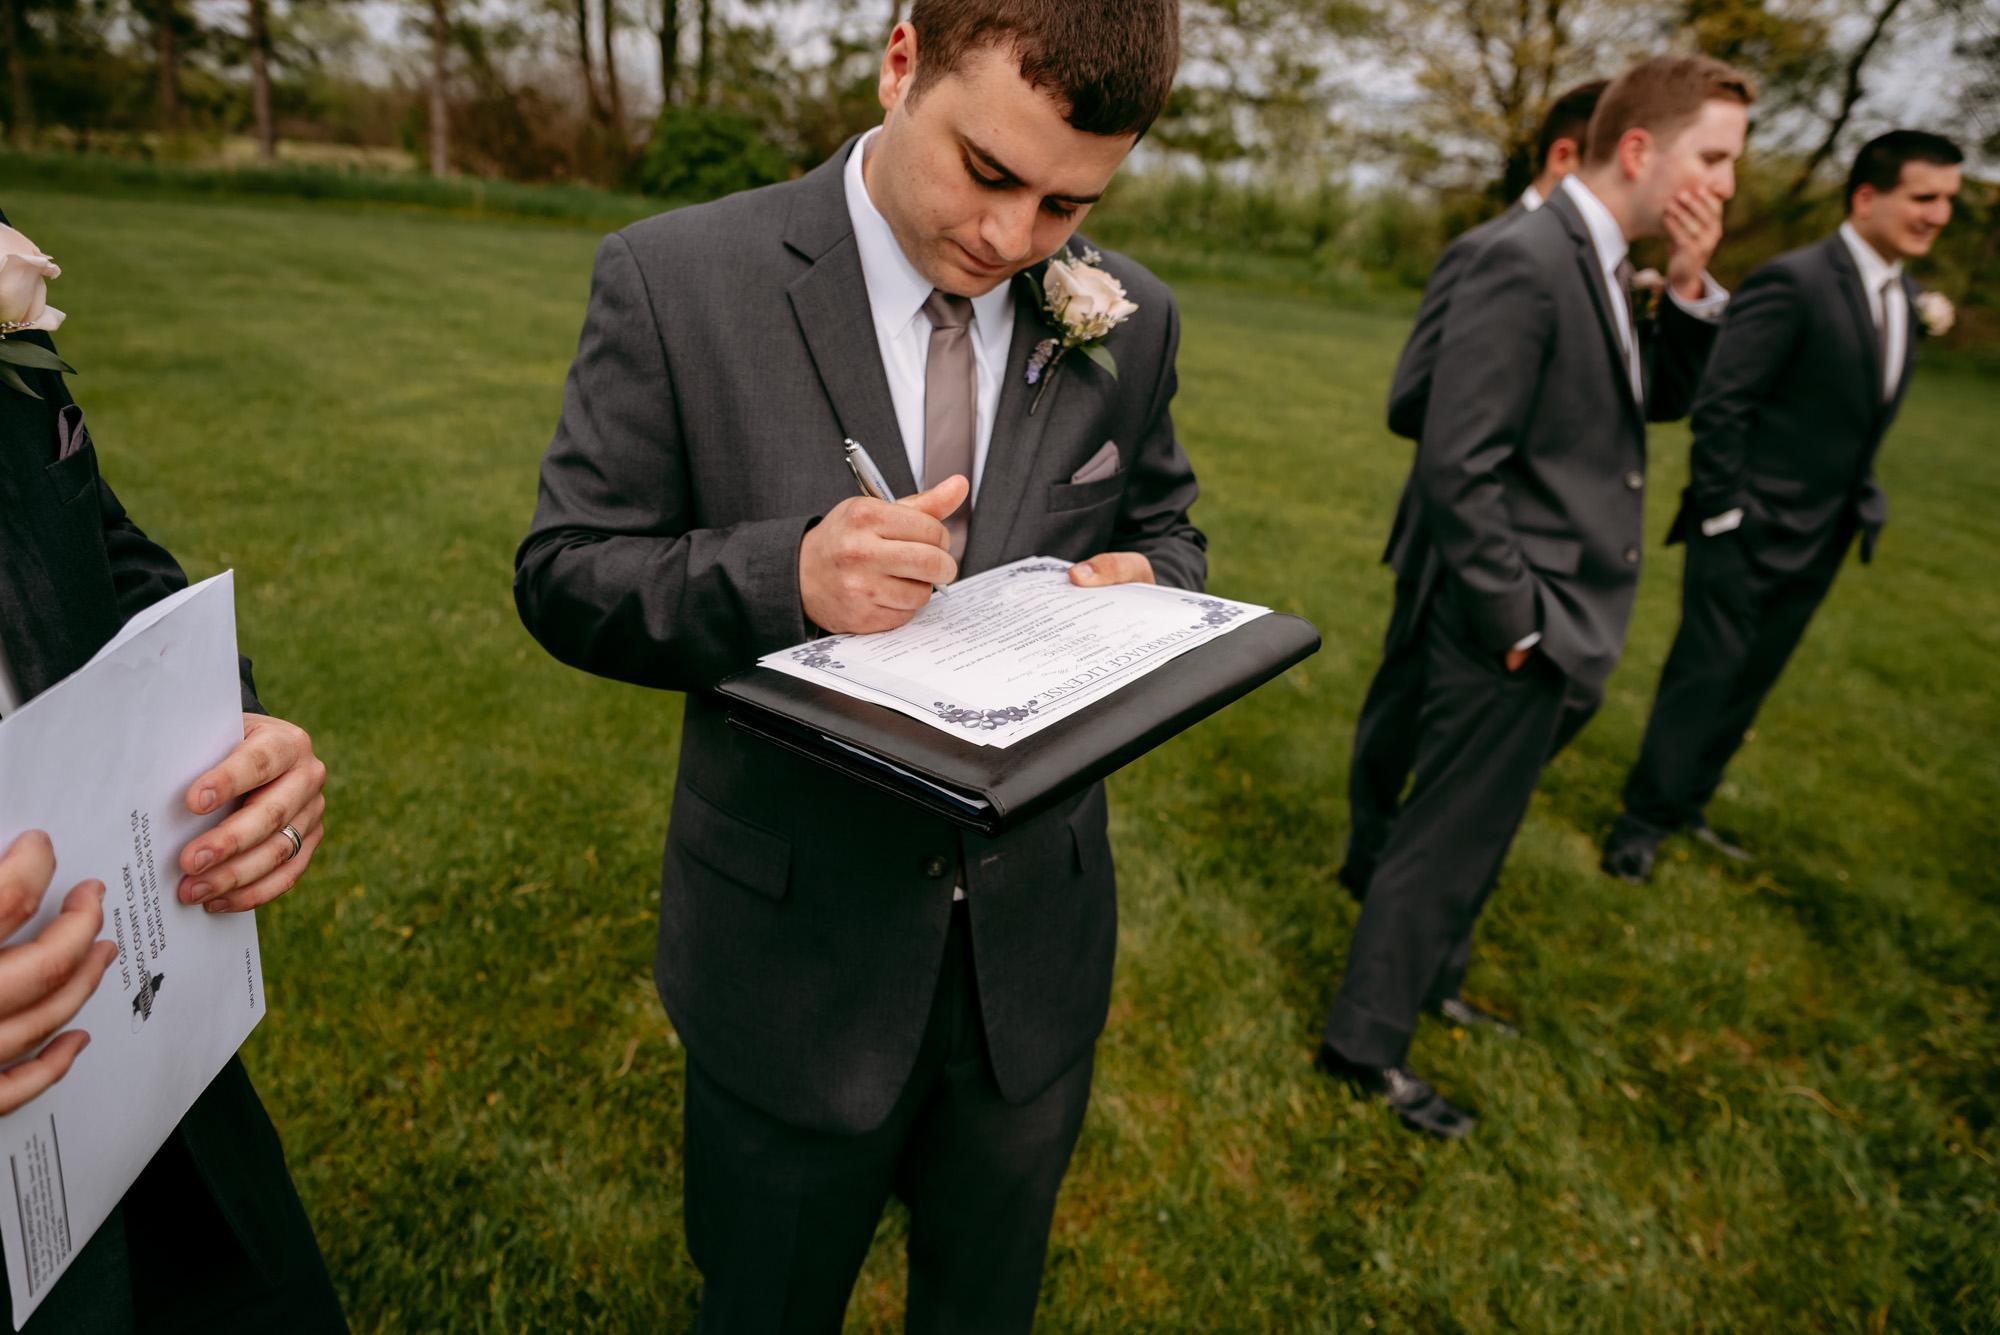 orchard-farms-pavillion-wedding-rockton-IL-wedding-photographers-299.jpg